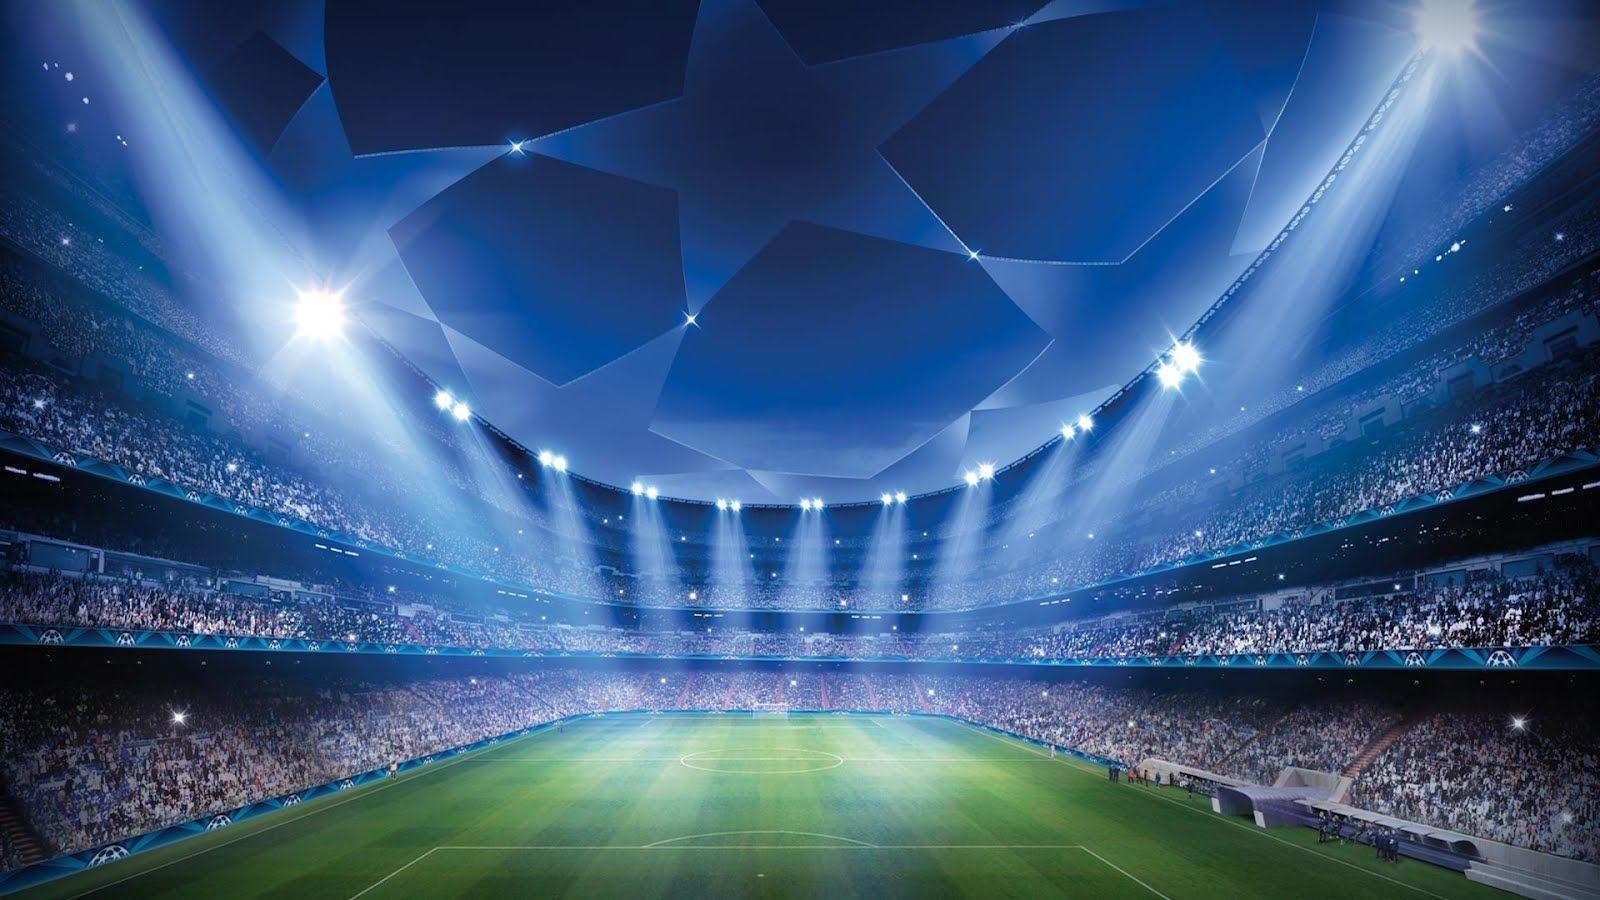 champions league wallpaper 9e0 | hd wallpaper, blue wallpaper